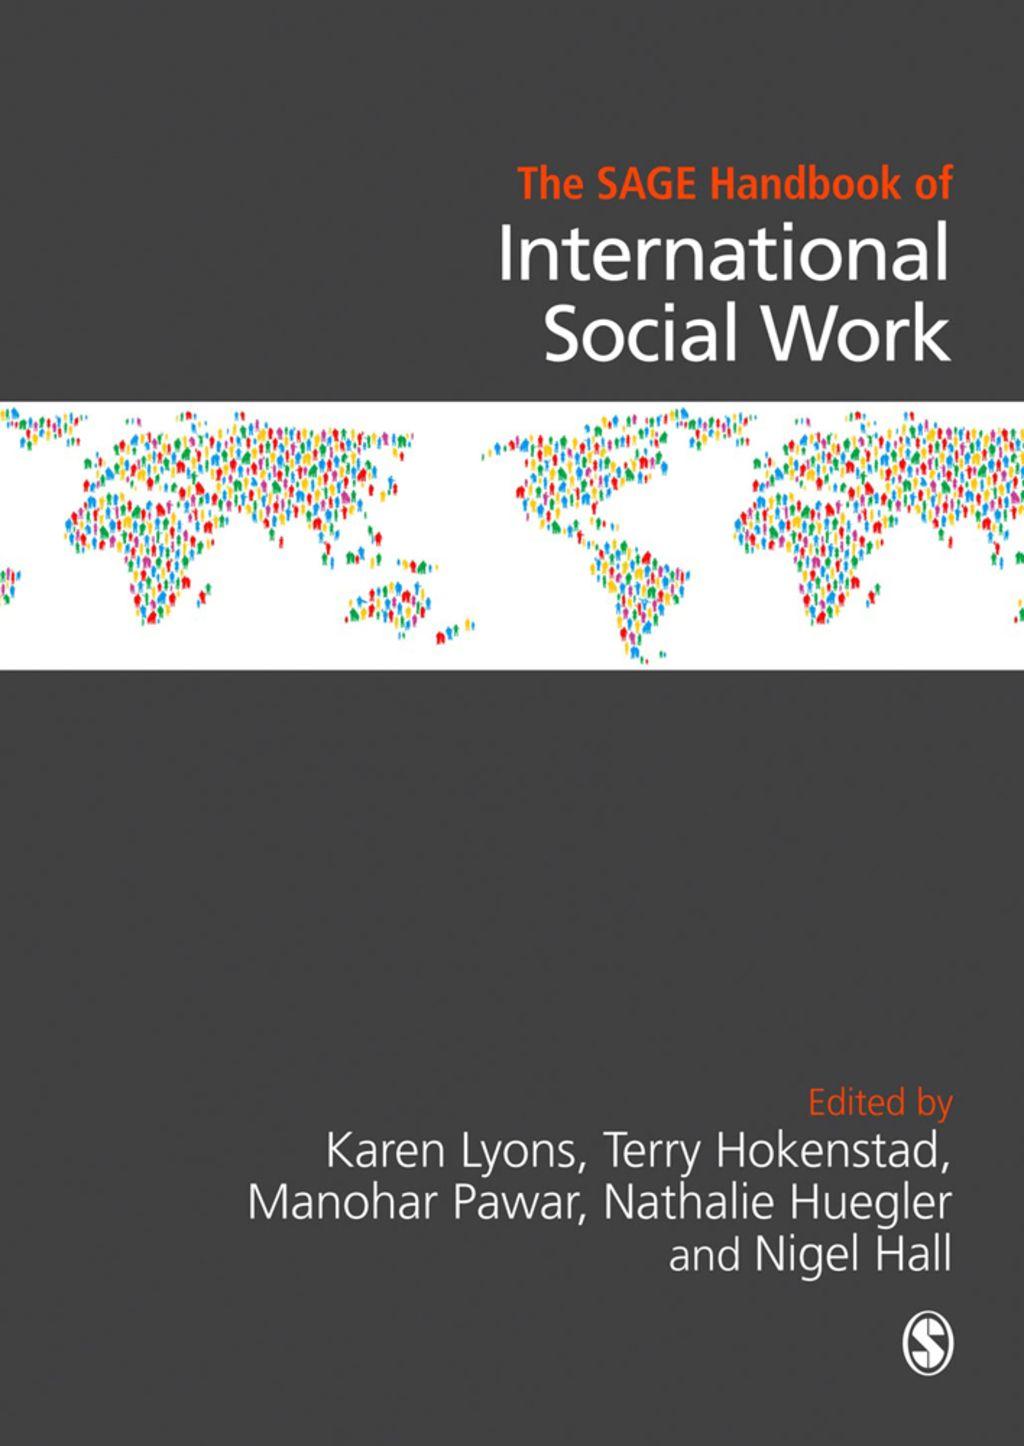 The Sage Handbook Of International Social Work 1st Edition Ebook Rental In 2021 International Social Work Social Work Social [ 1446 x 1024 Pixel ]